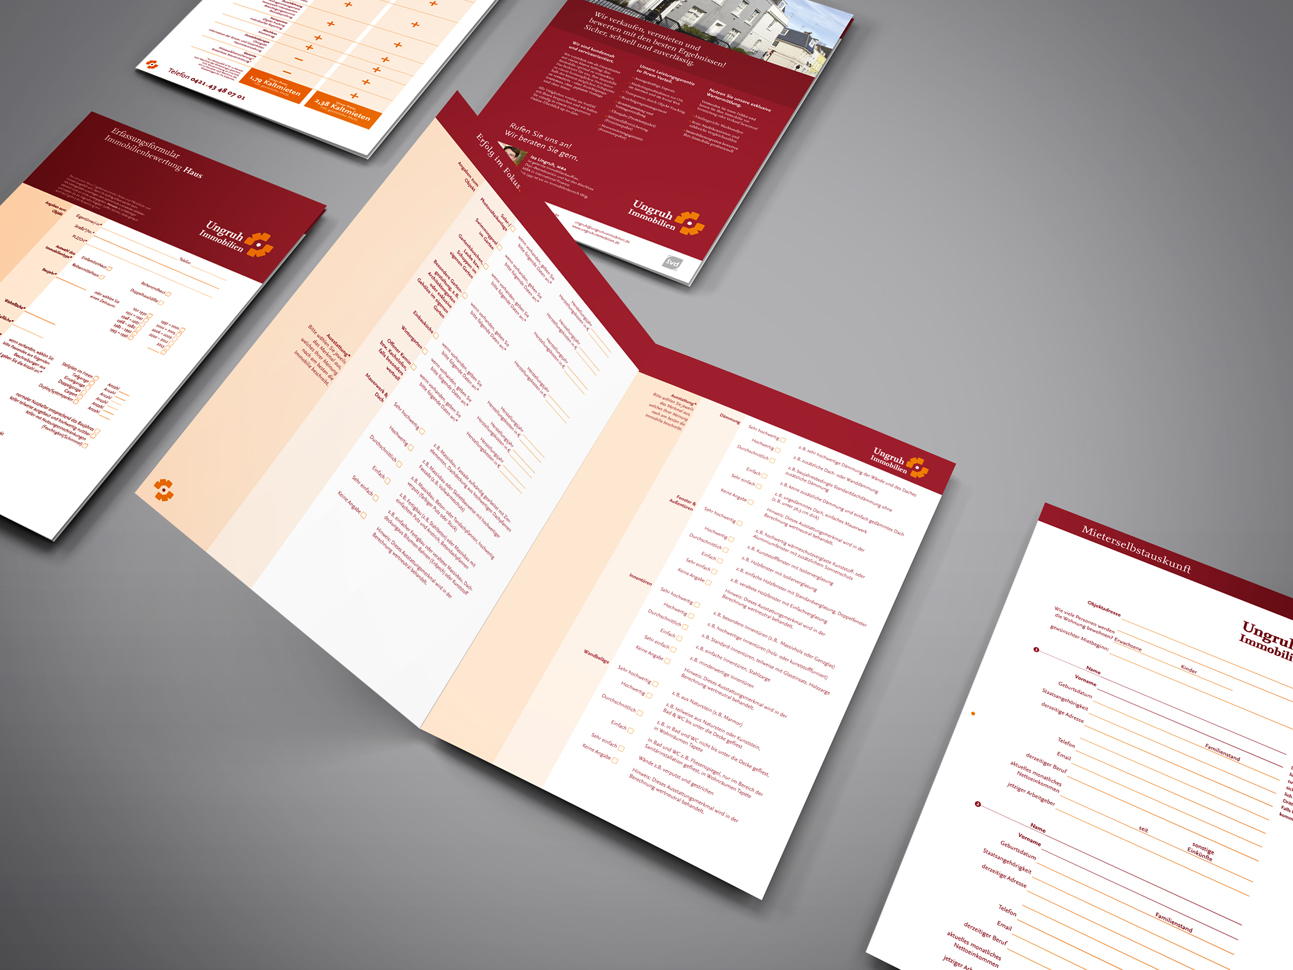 martin_zech_design_corporate_design_ungruh_immobilien_formulare